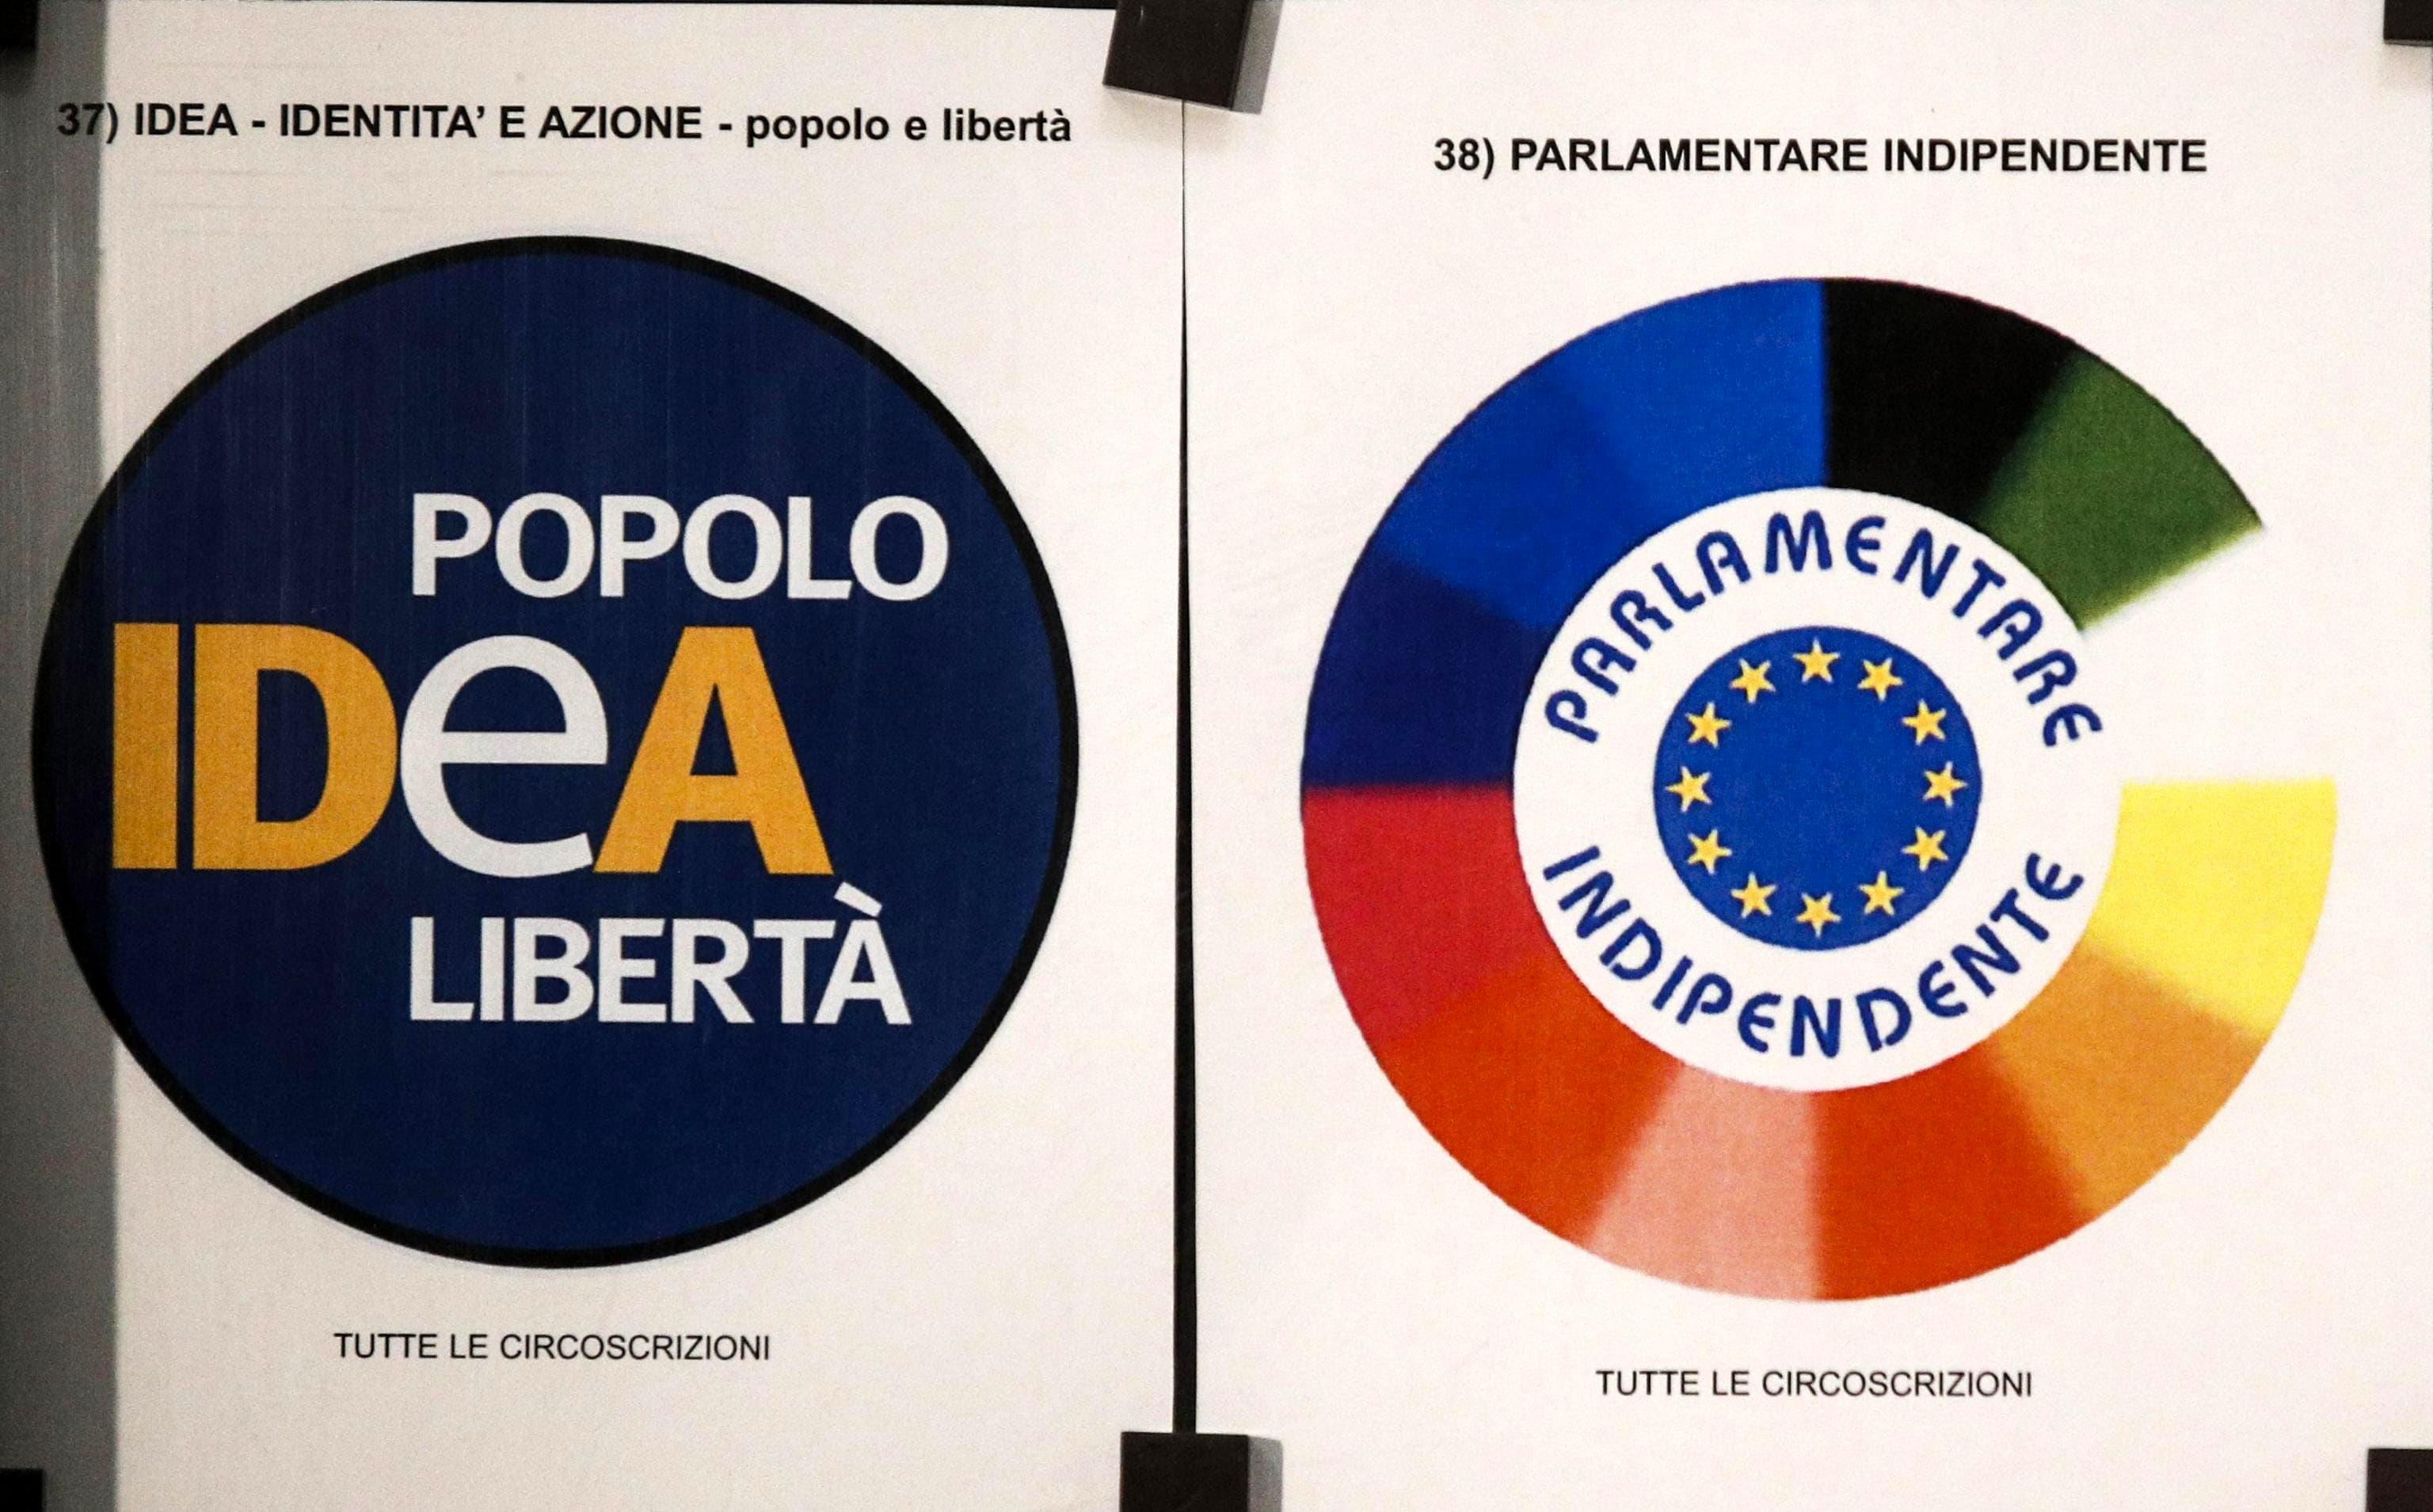 elezioni europee simboli depositati-2